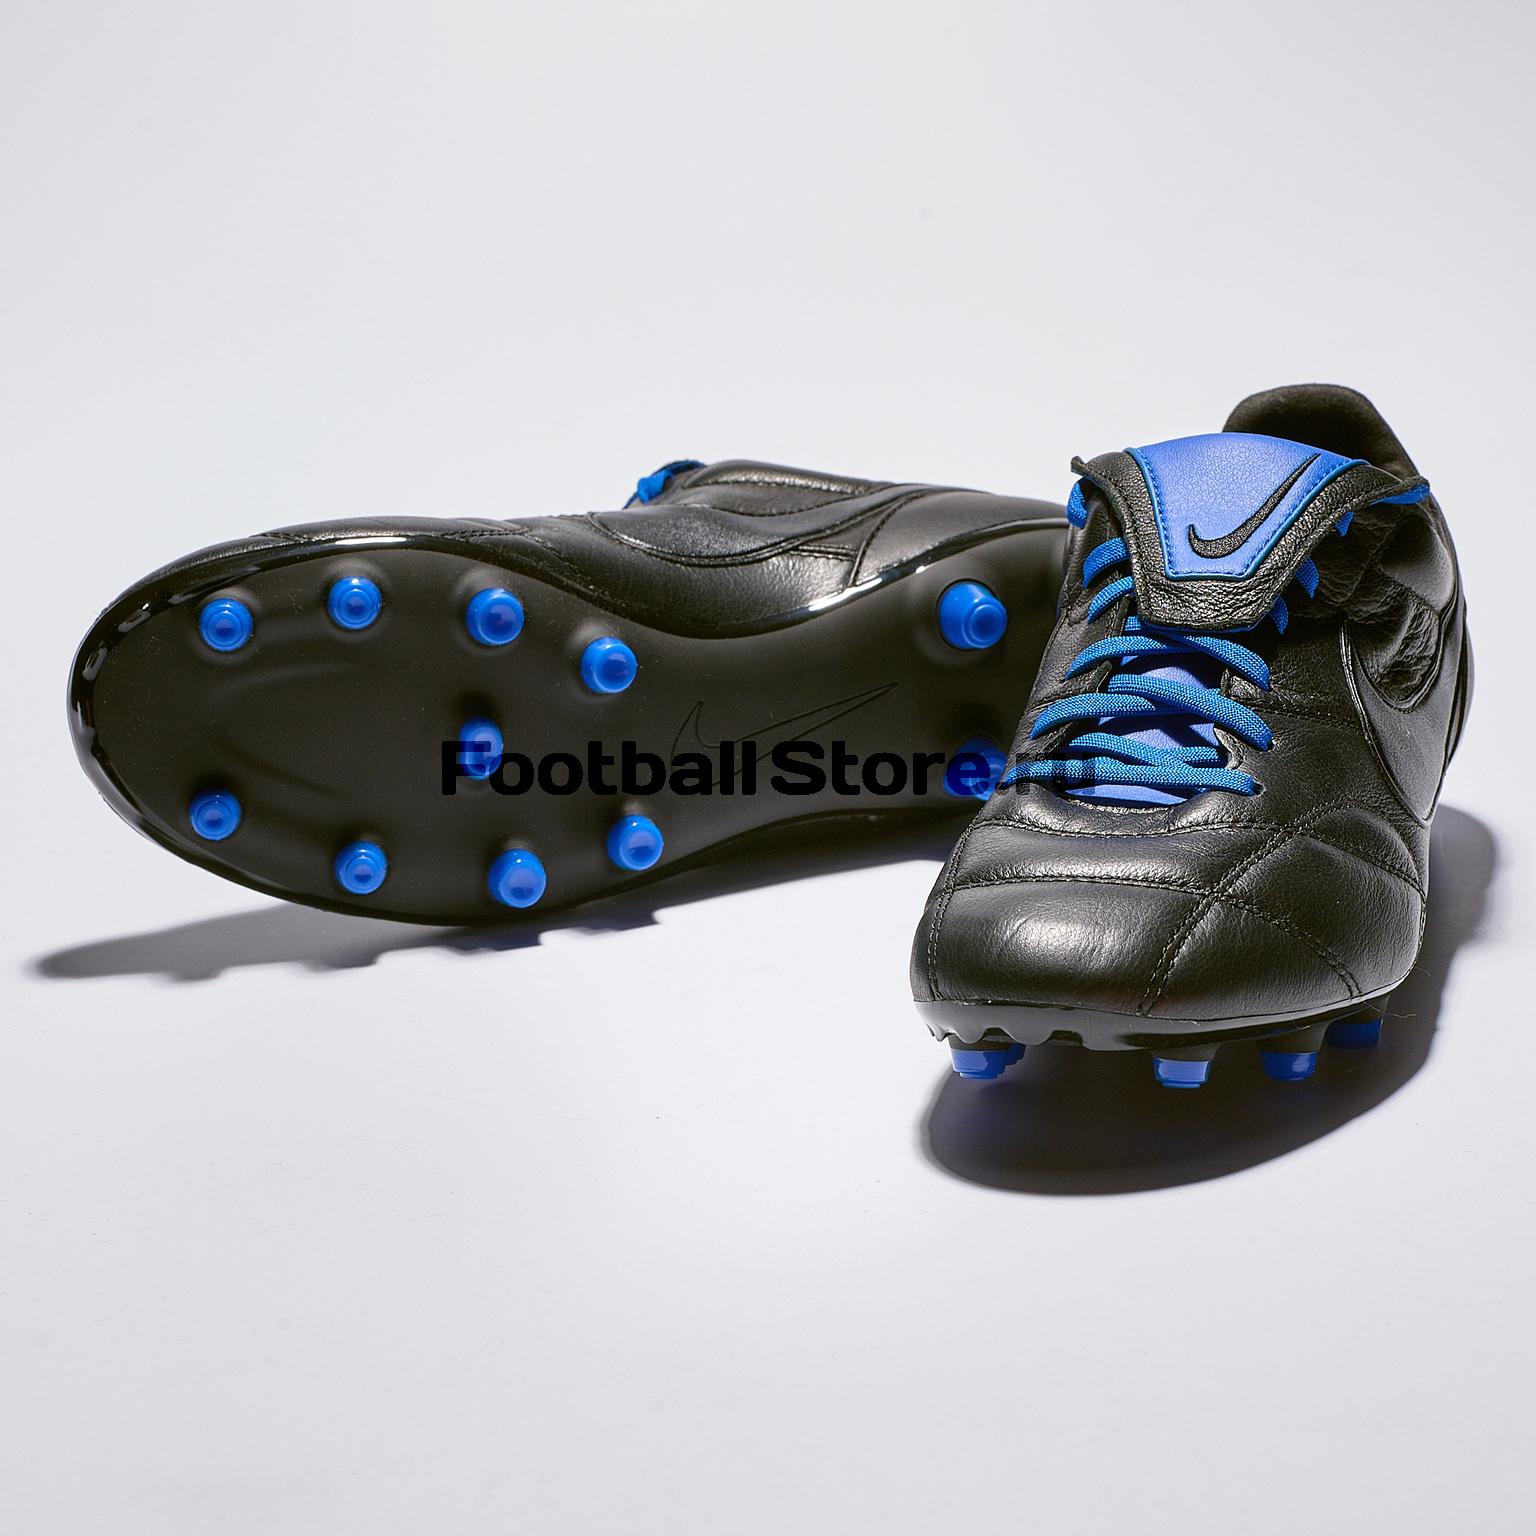 915d1707 ... Бутсы Nike Premier II FG 917803-040. О ТОВАРЕ; РАСЧЕТ ДОСТАВКИ